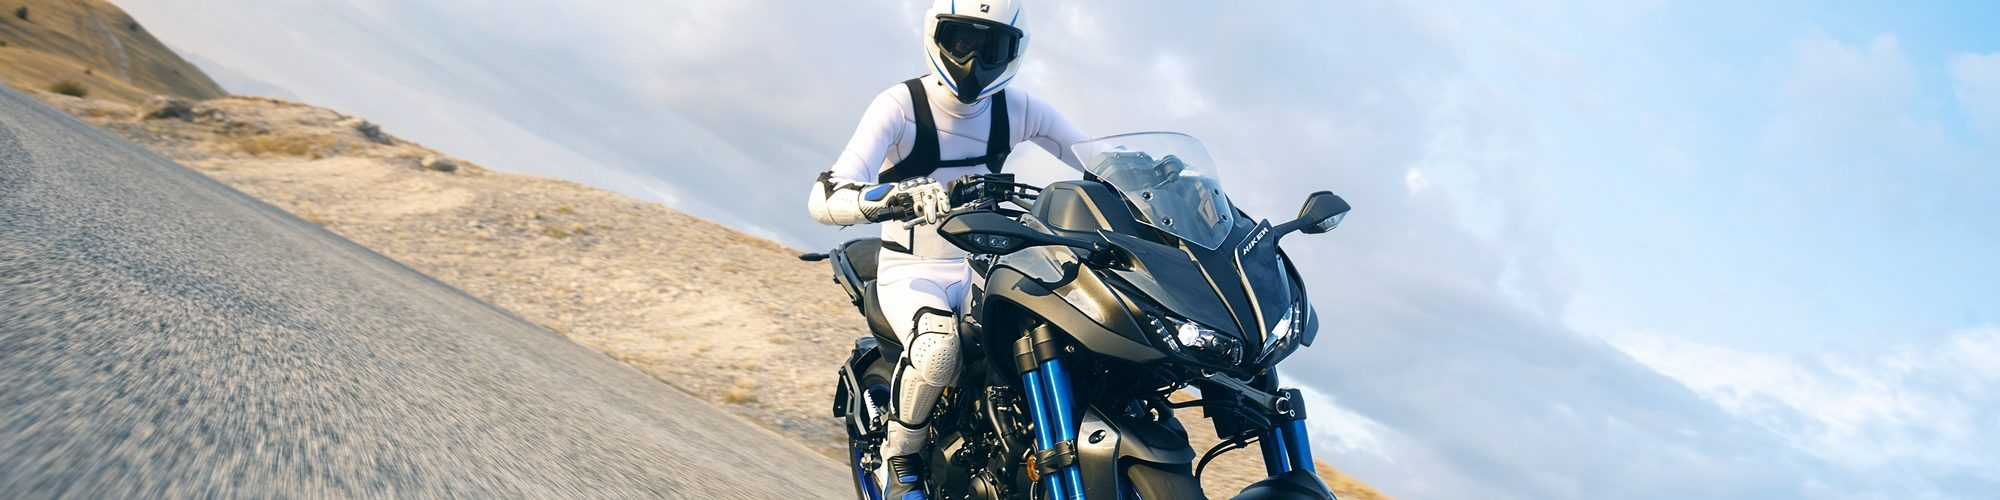 Yamaha MXT 850 NIKEN bestellen